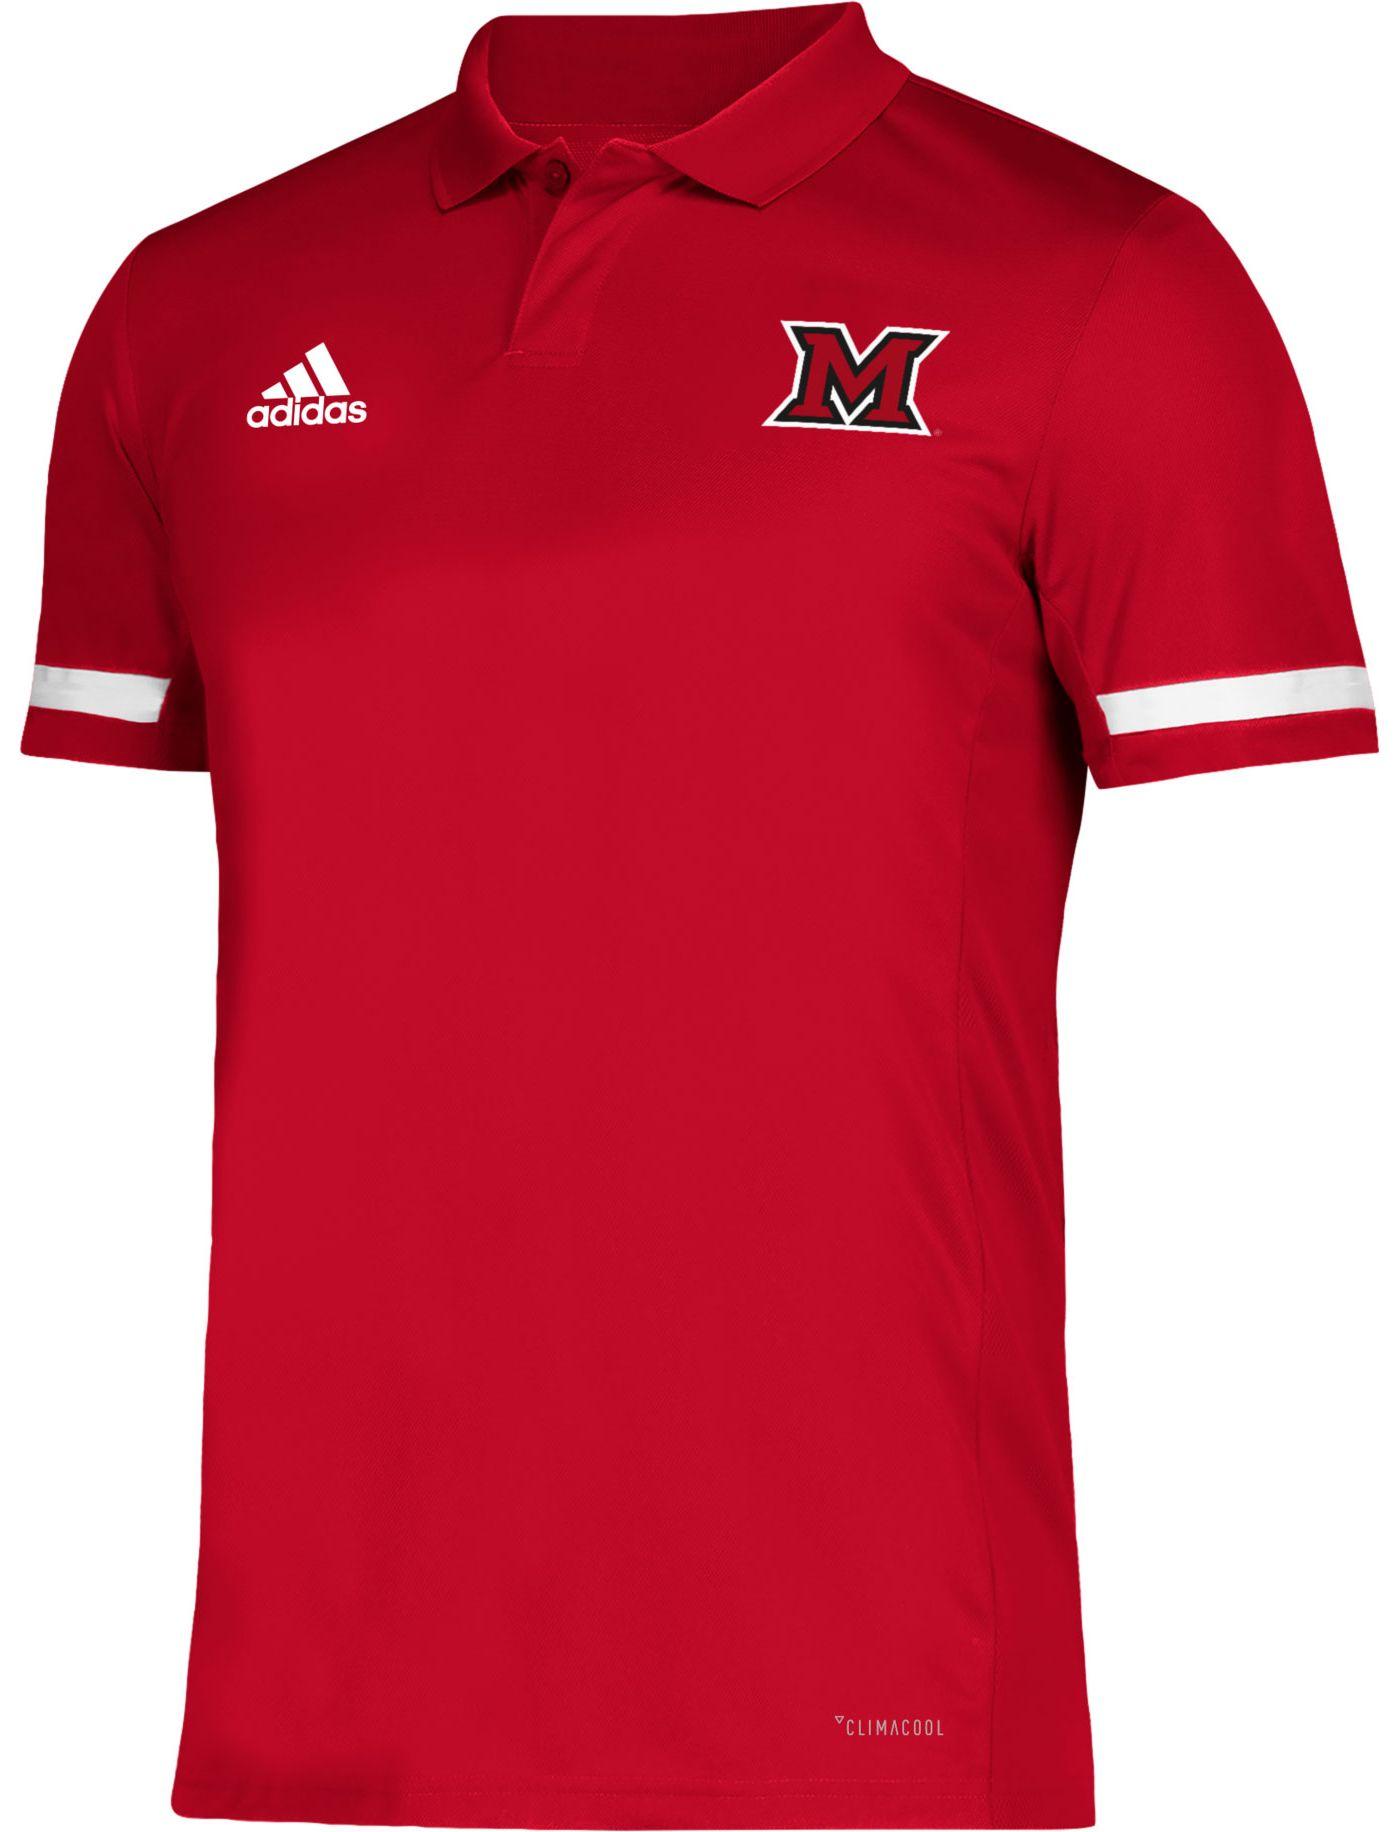 adidas Men's Miami RedHawks Red Team 19 Sideline Football Polo